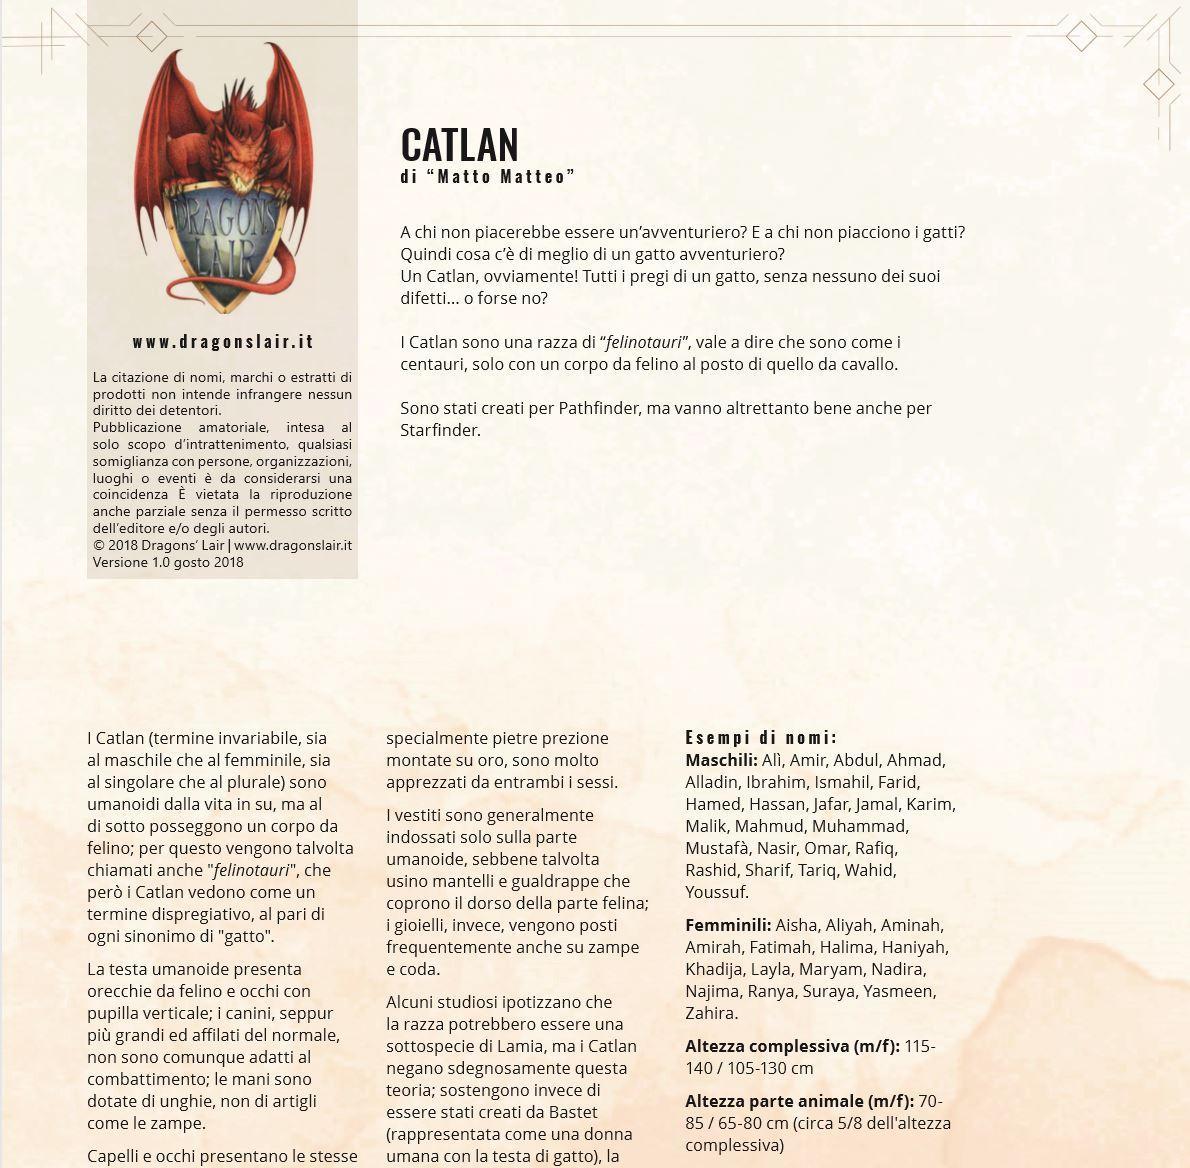 Catlan